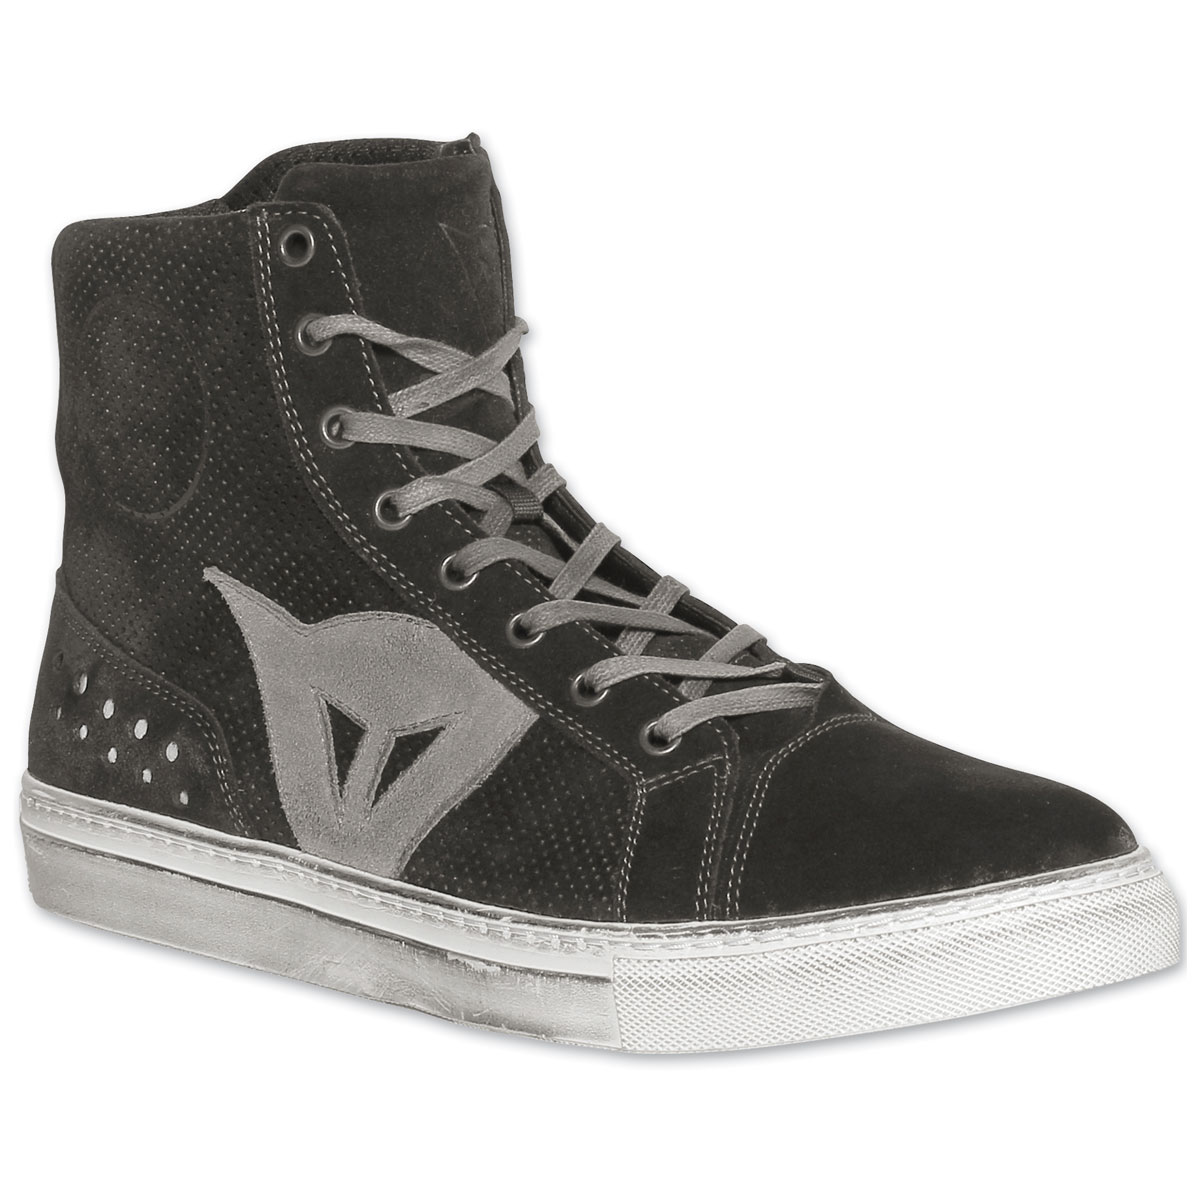 Dainese Men's Street Biker Air Black/Anthracite Shoes